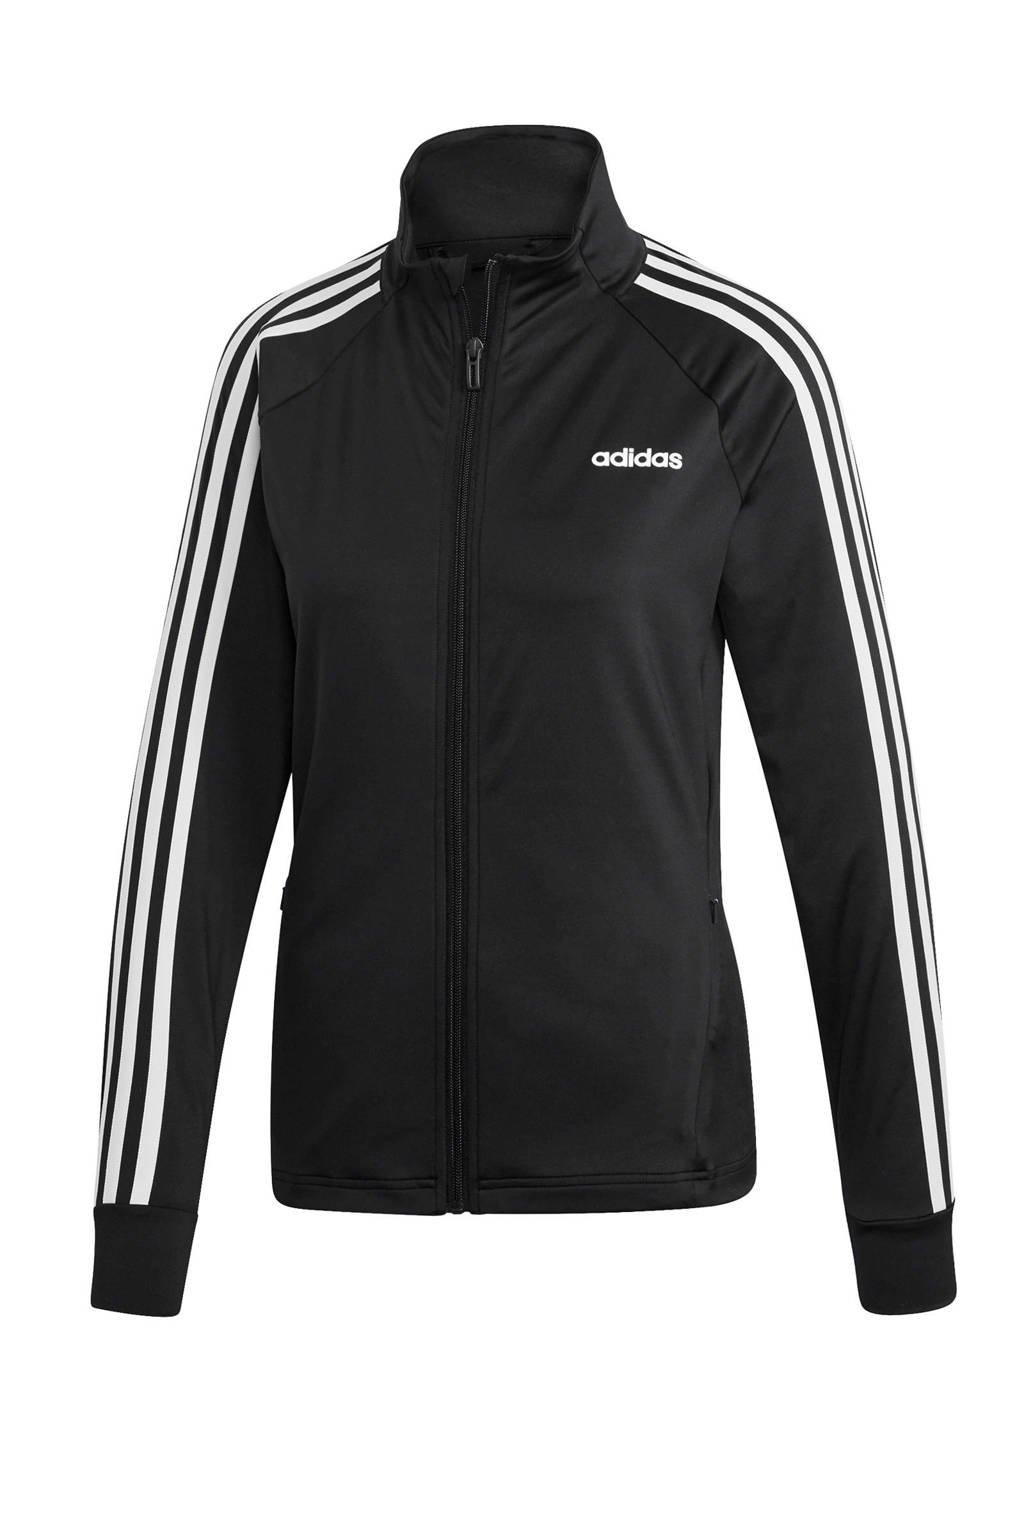 adidas Performance Designed2Move sportvest zwart/wit, Zwart/wit